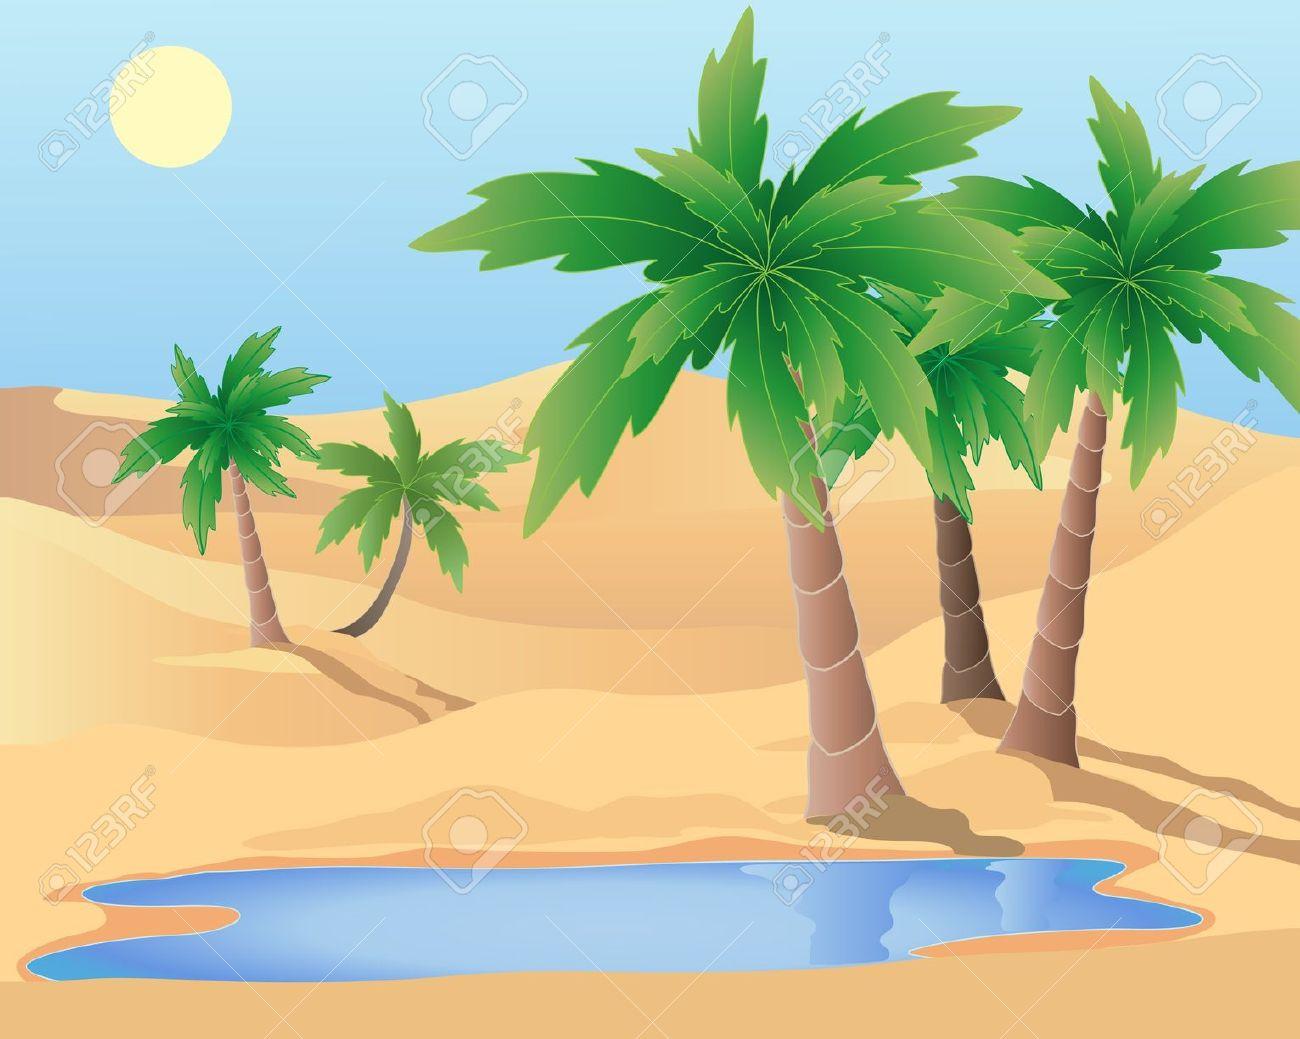 Palm simple images transitionsfv. Desert clipart